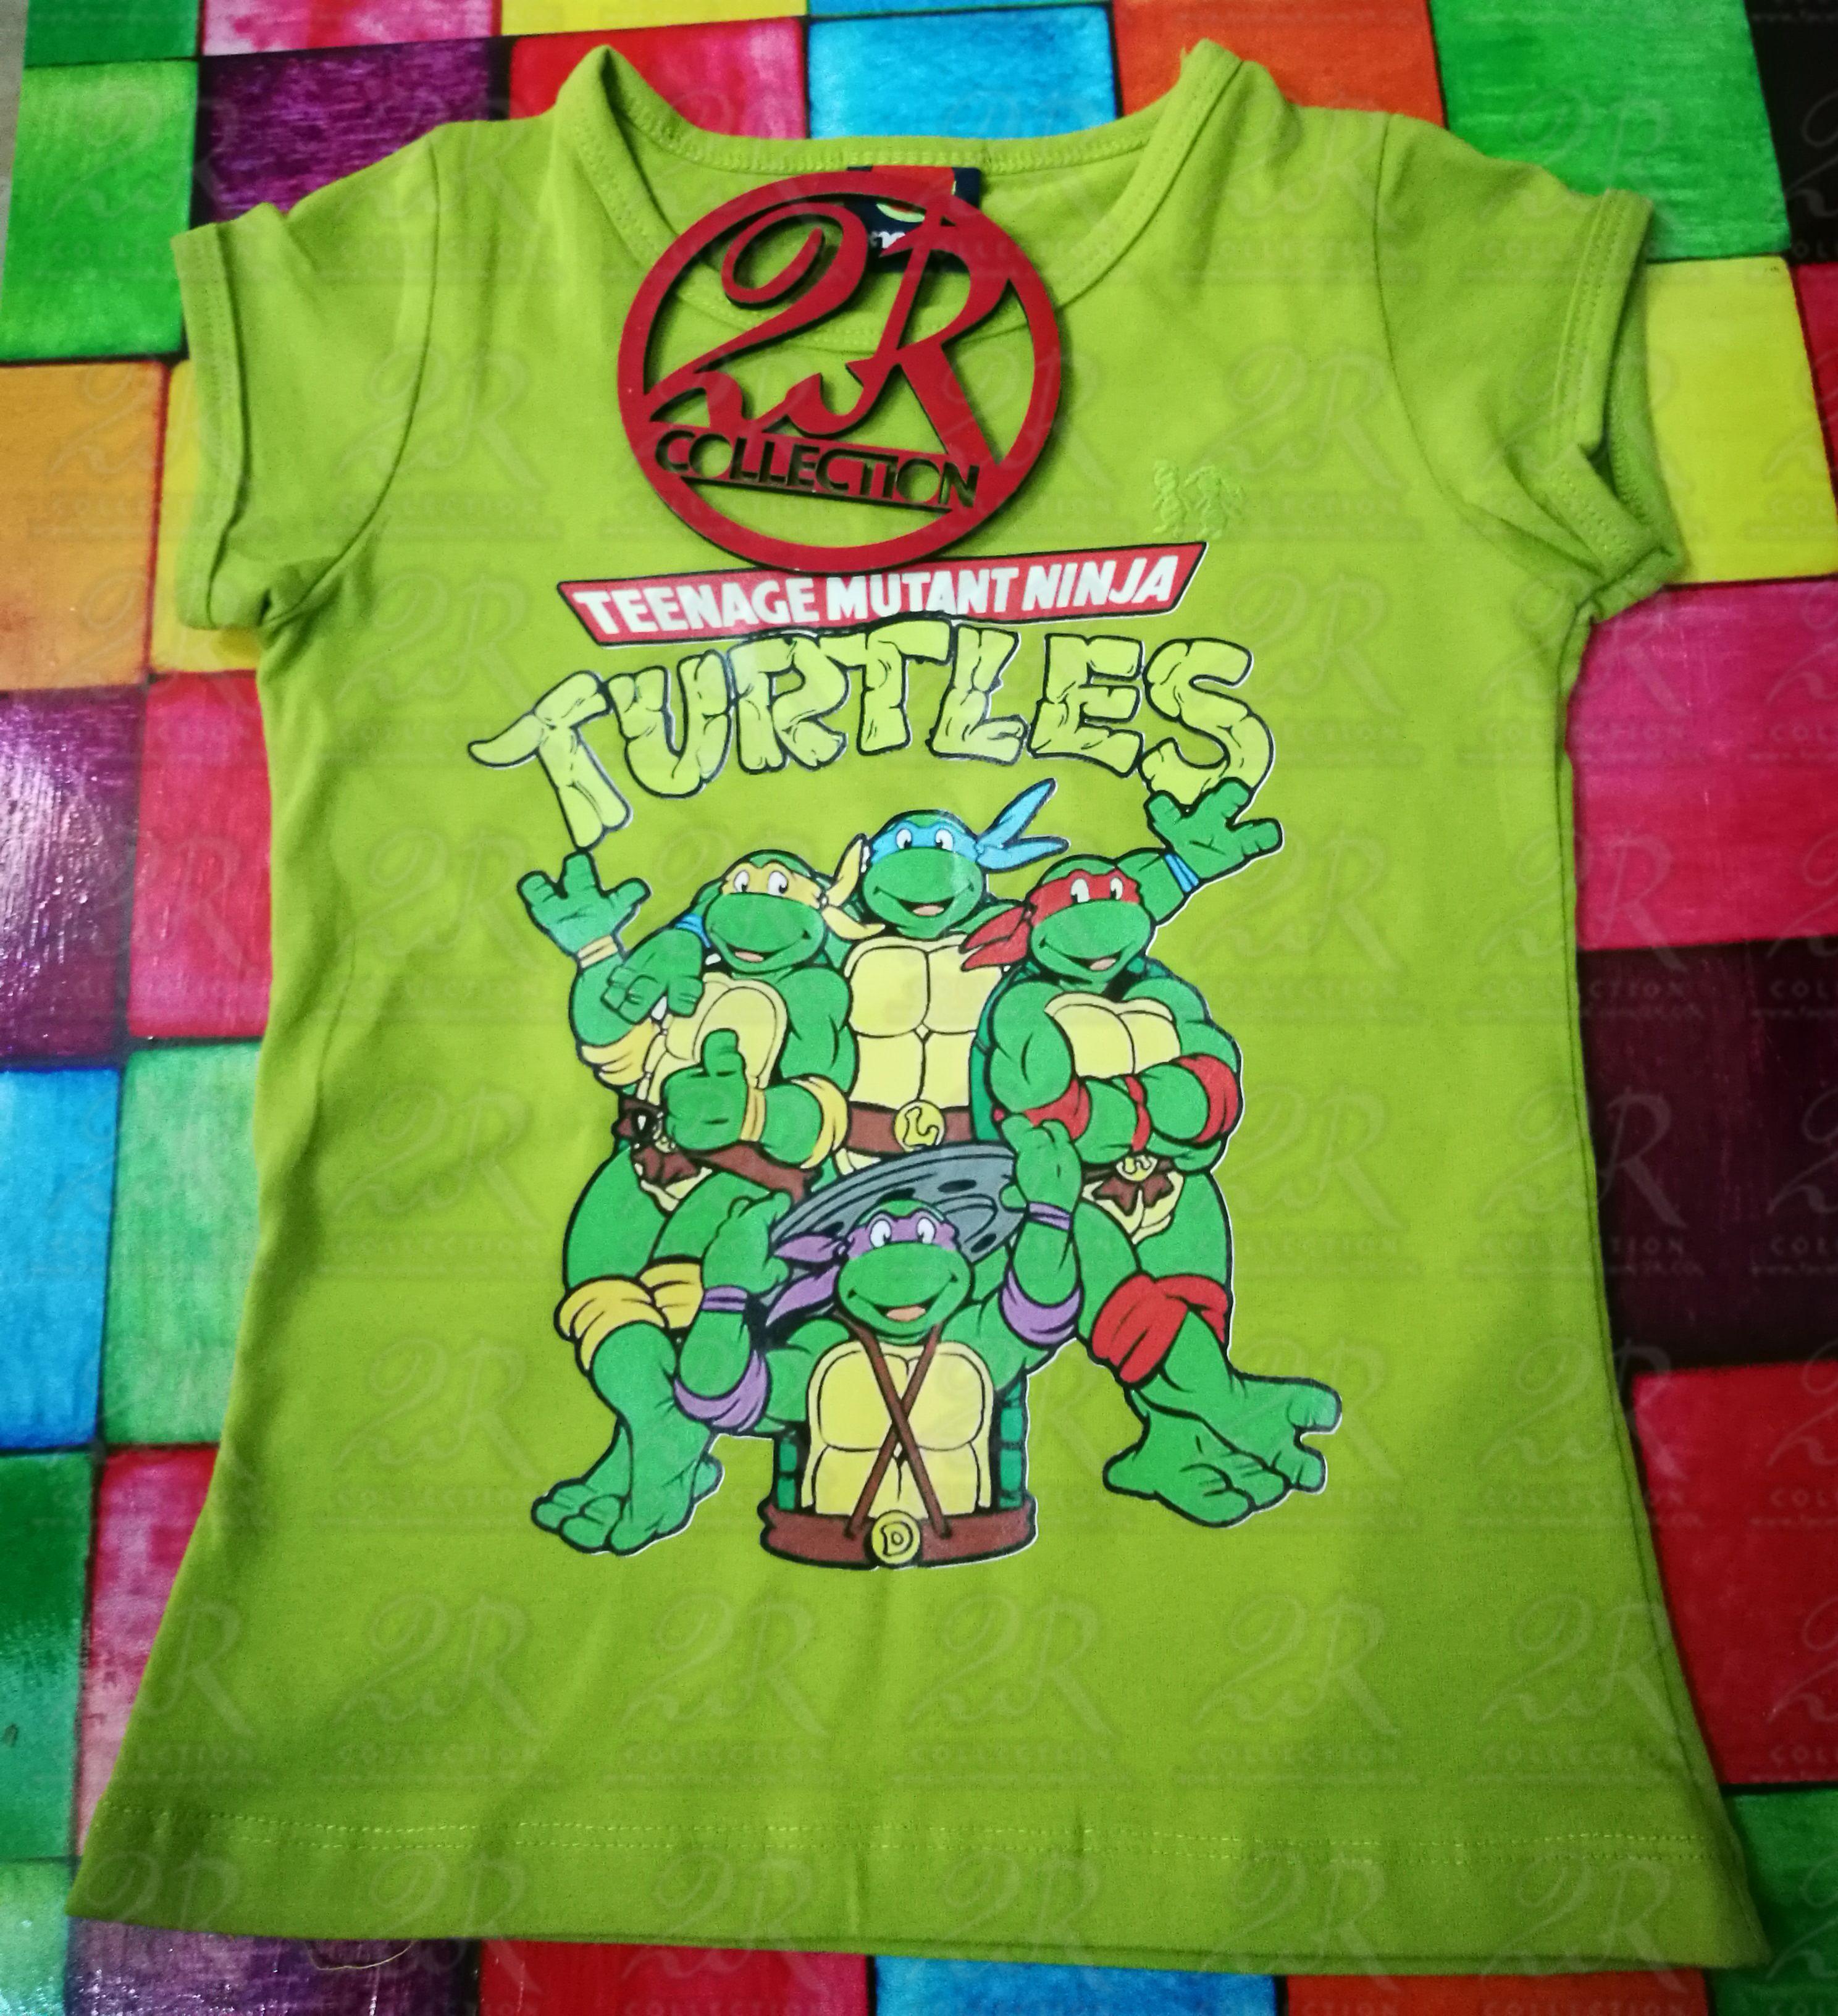 T Shirt Turtles تيشرت سلاحف نينجا Printed Shirts Mens Tshirts Mens Tops